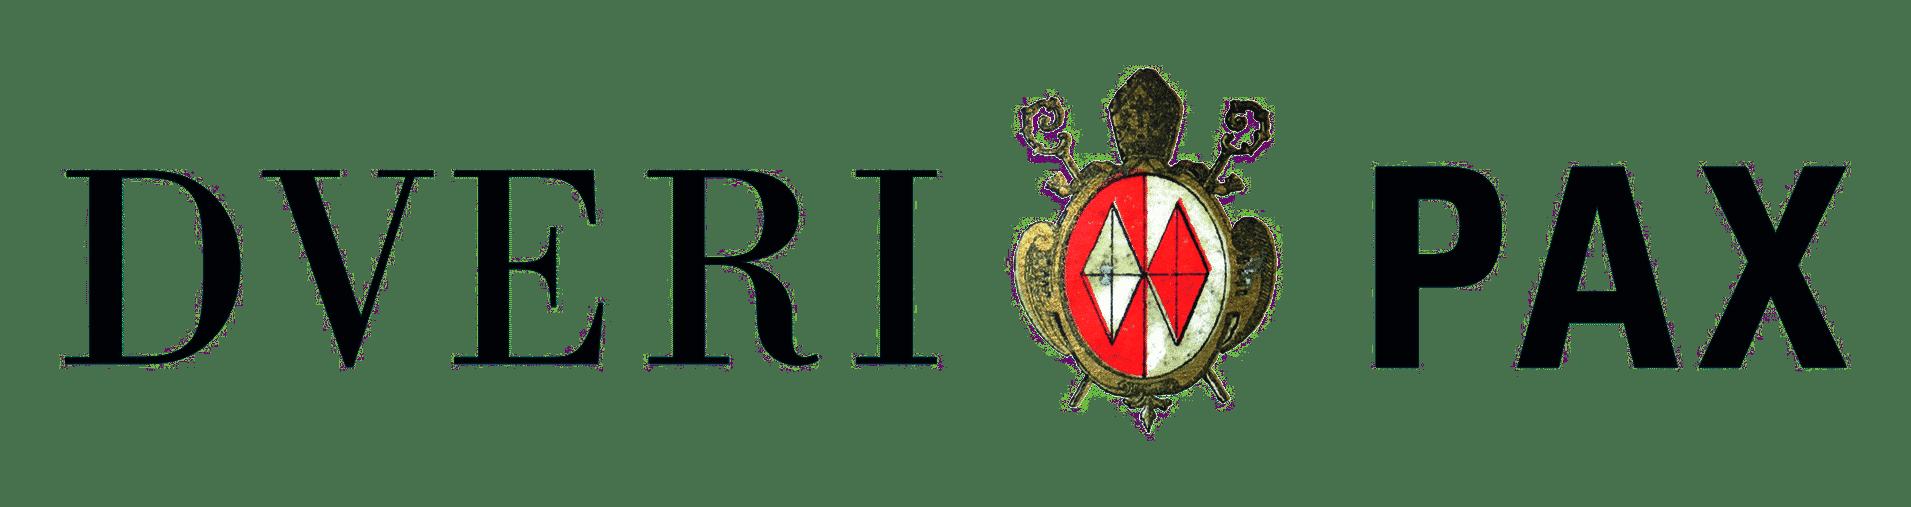 dveripax logo 1